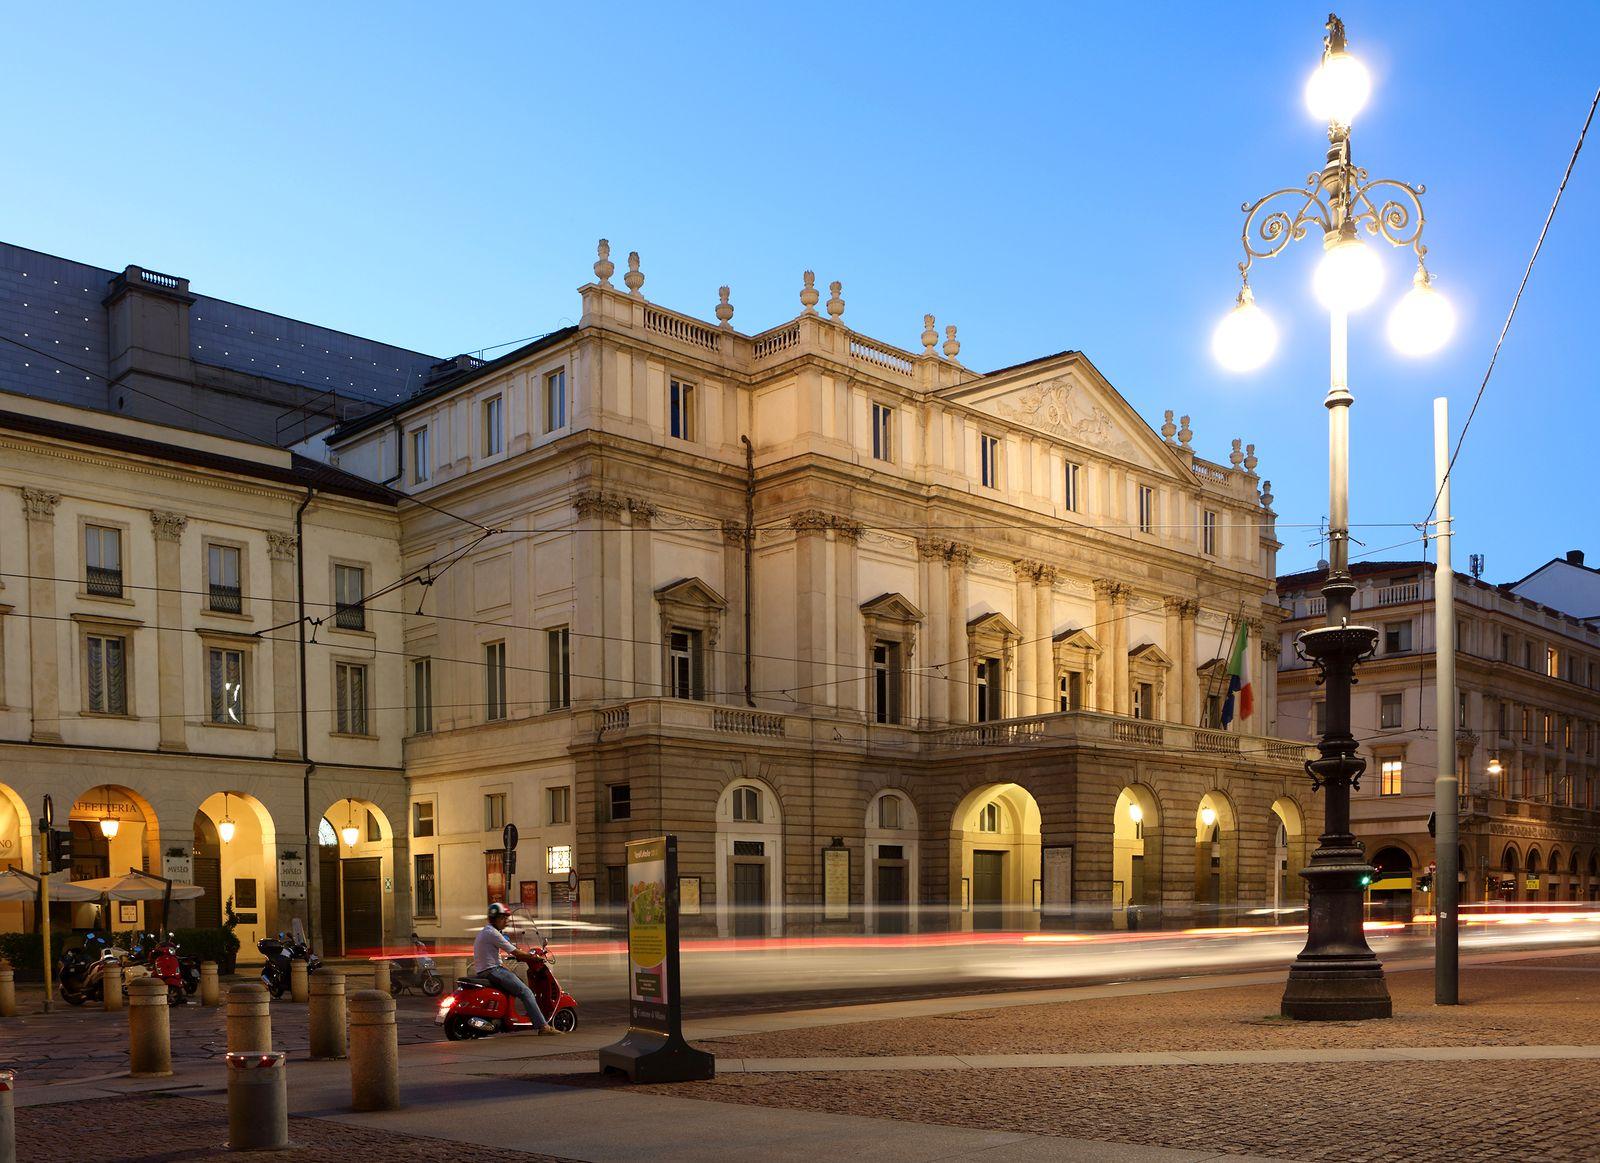 Italy, Lombardy, Milan, Teatro Alla Scala